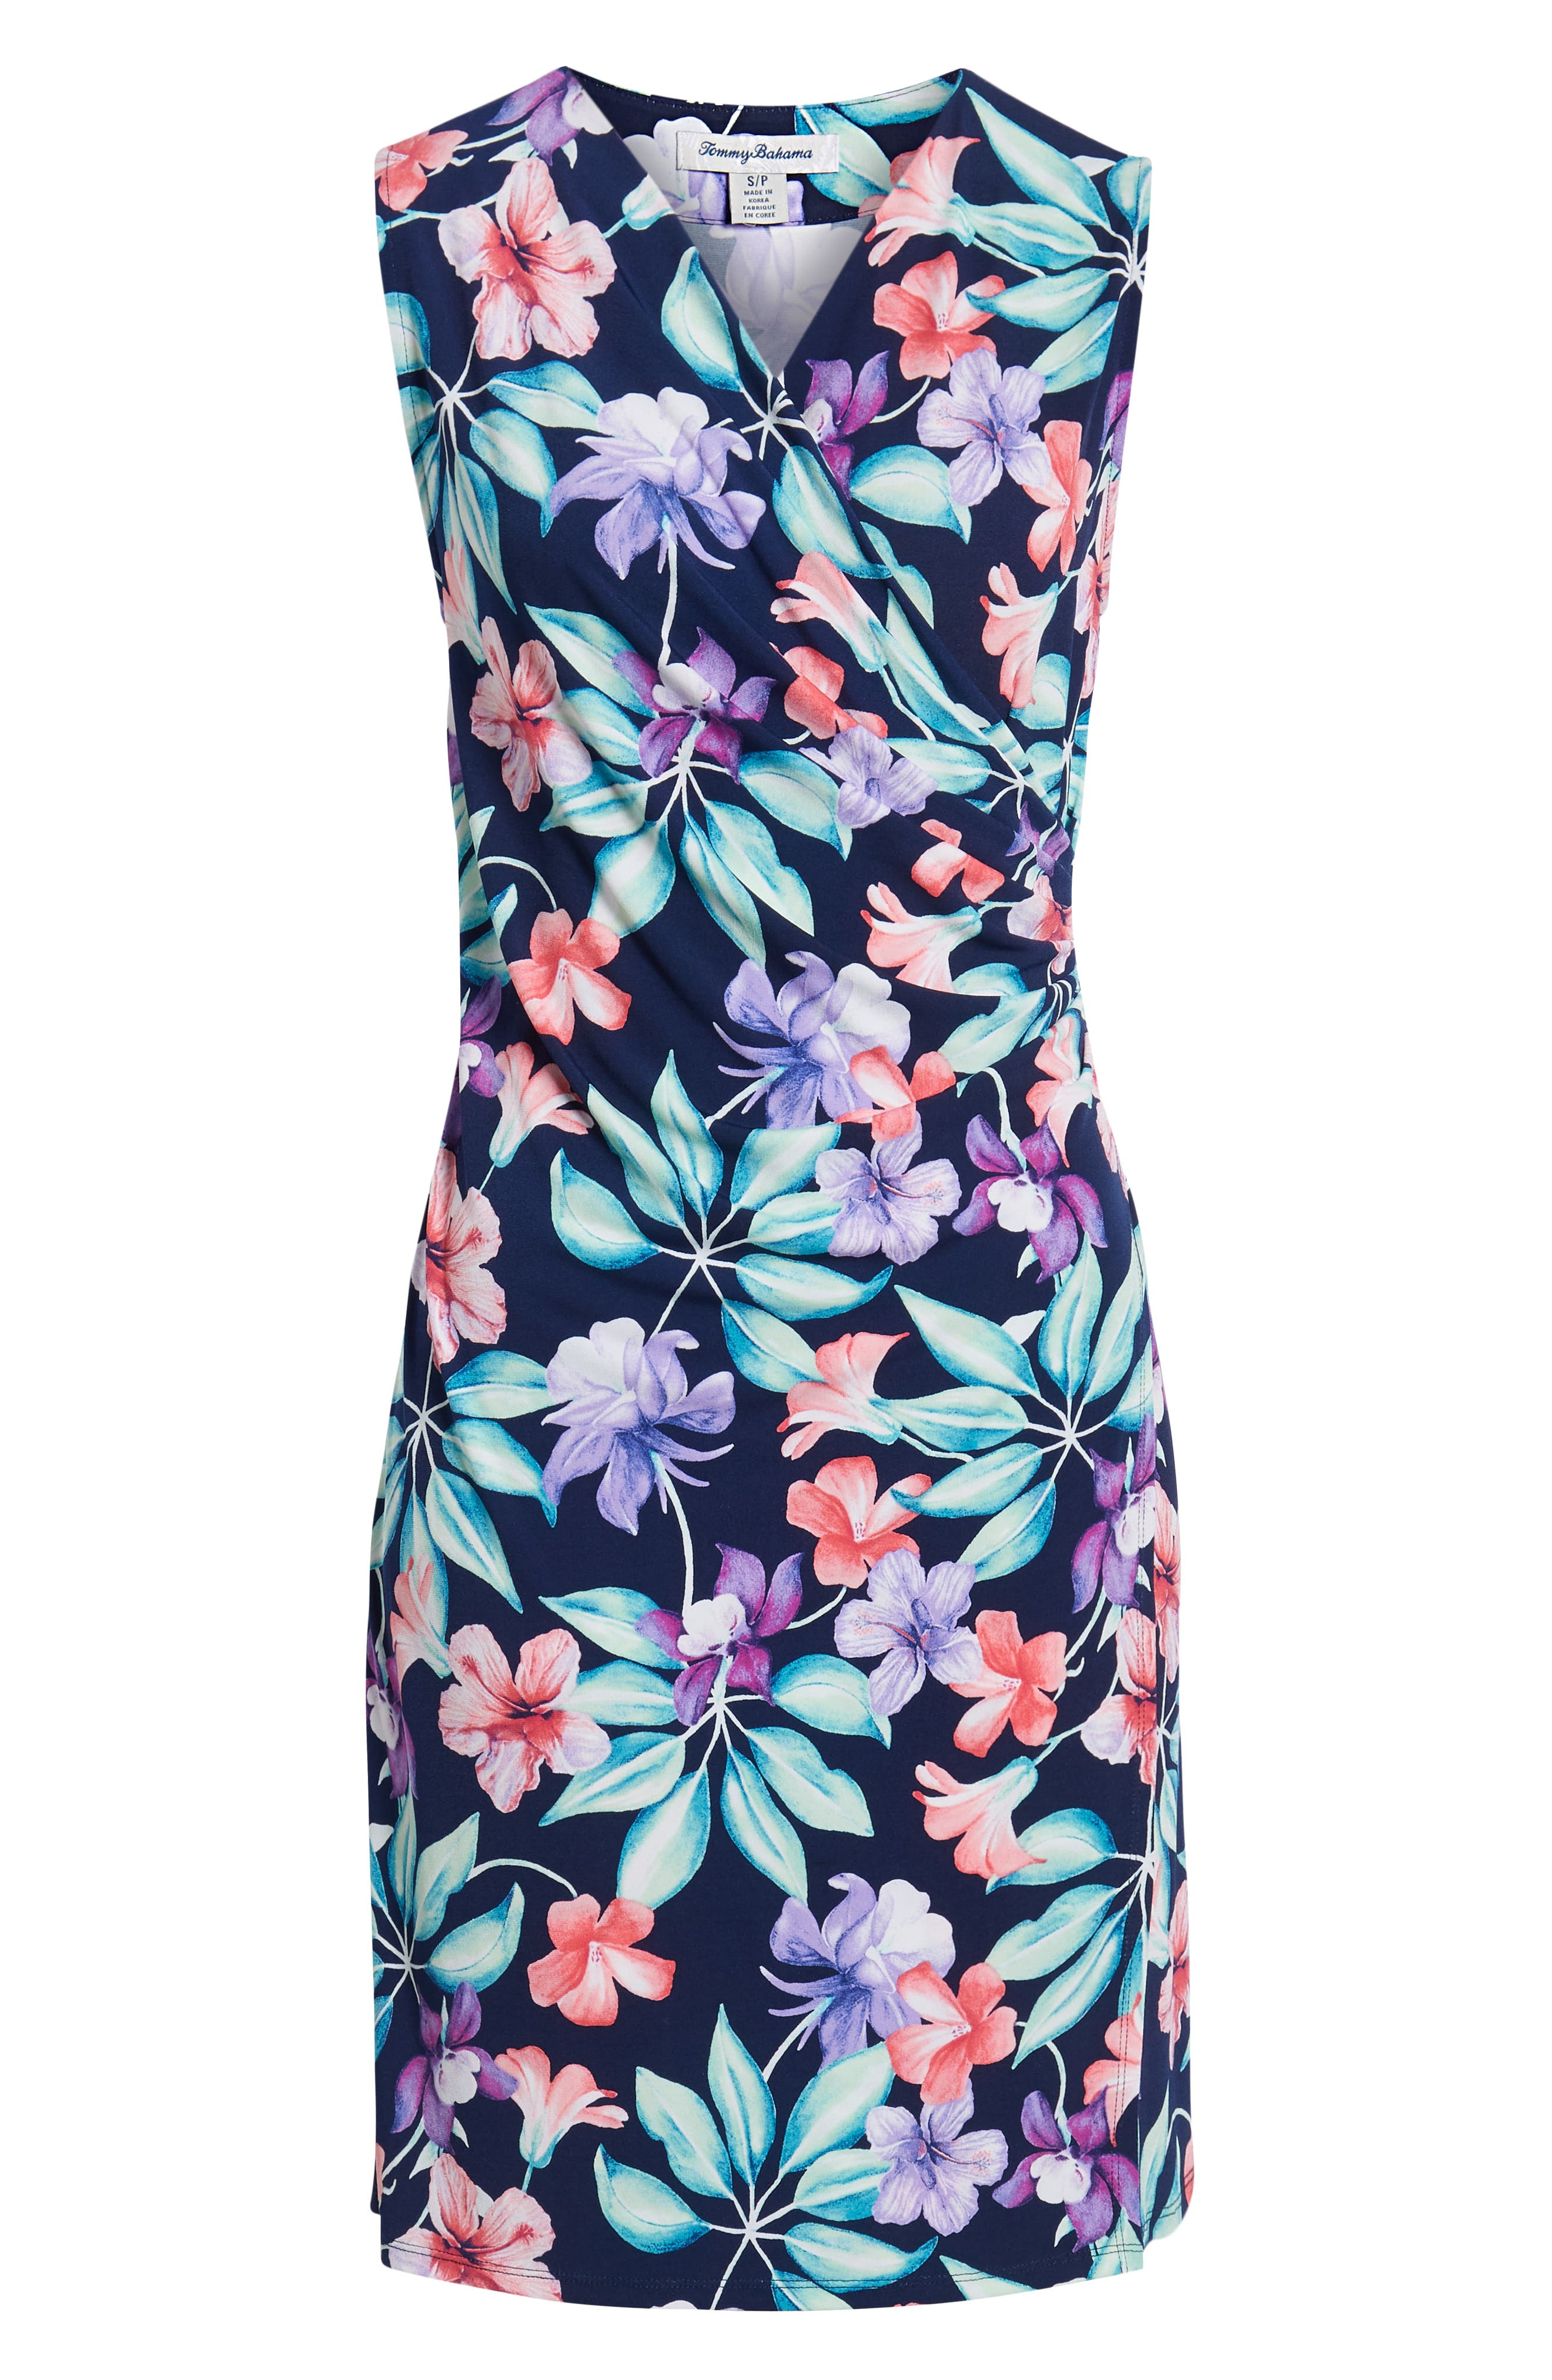 Tommy Bahama Dresses Villa Ibisco Faux Wrap Dress